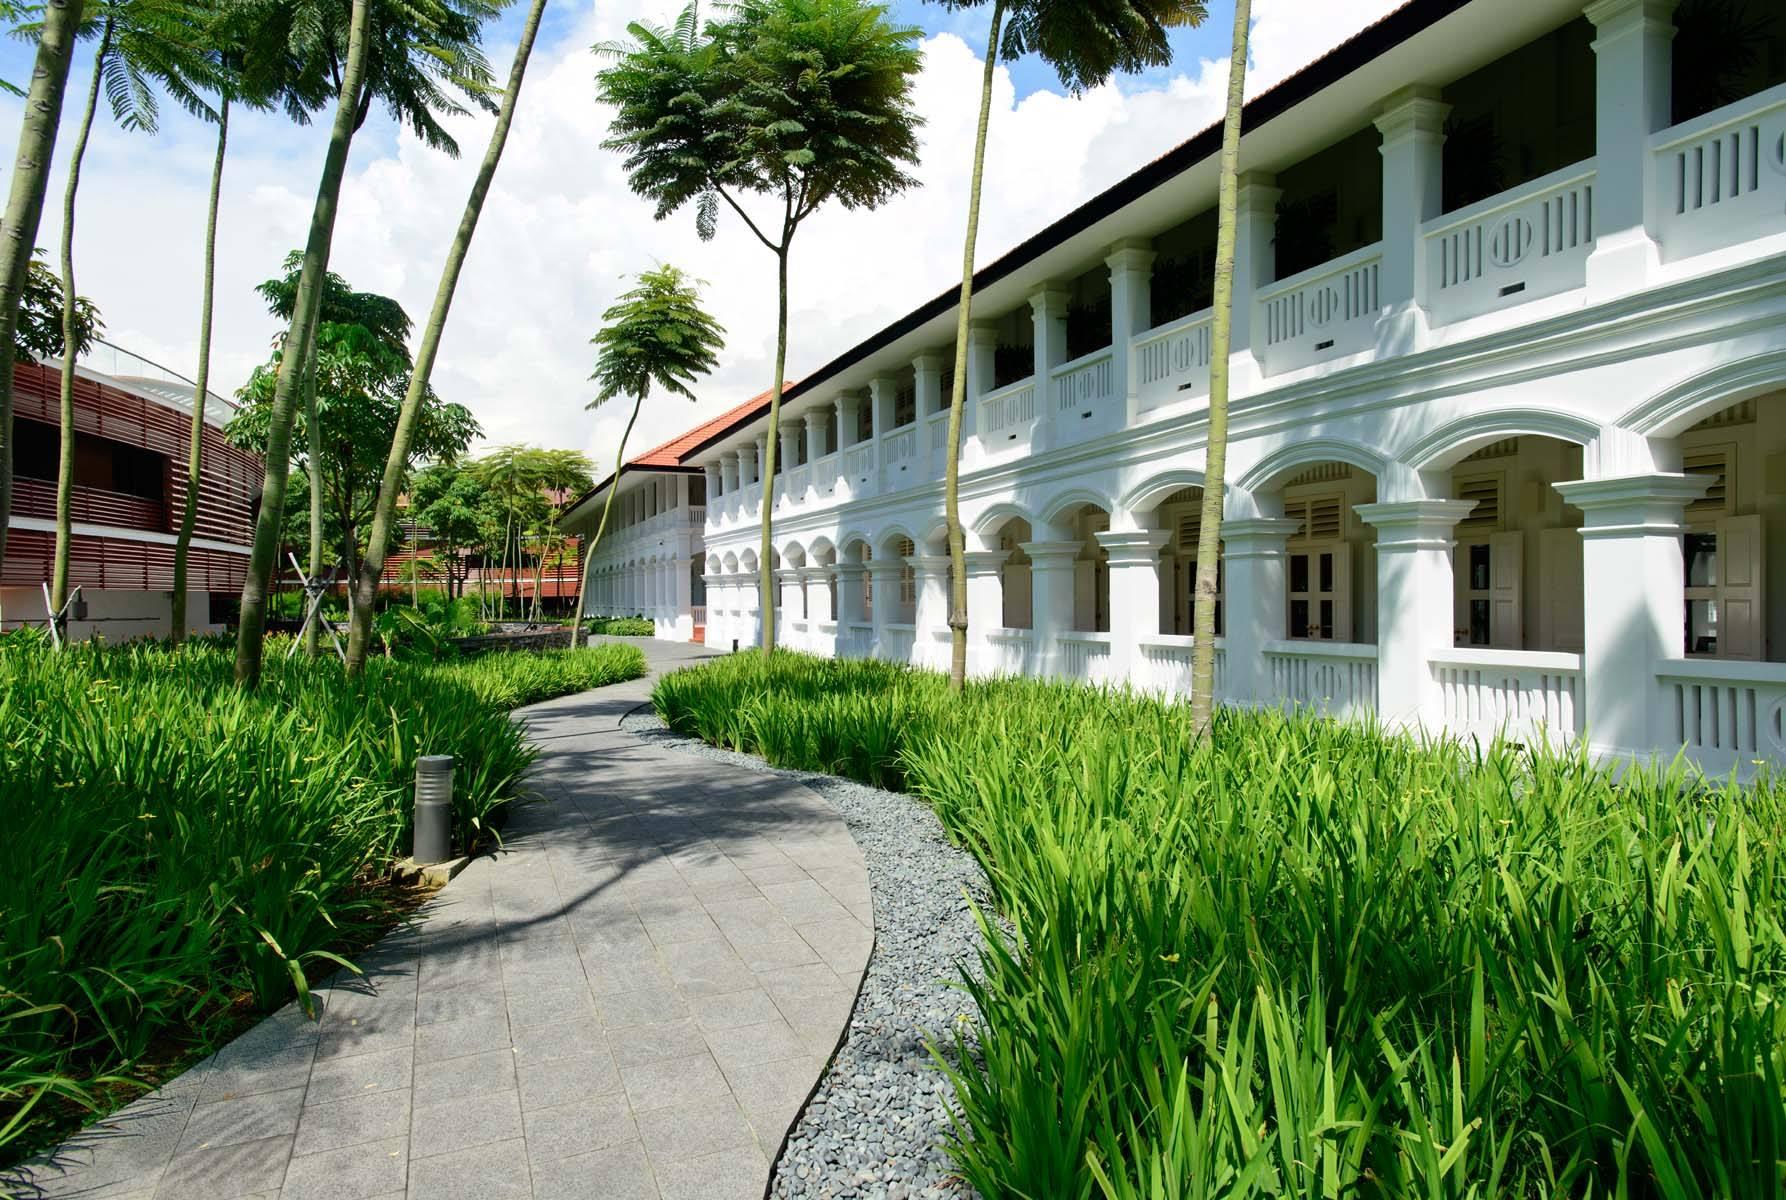 Capella hotel on Sentosa island, Singapore